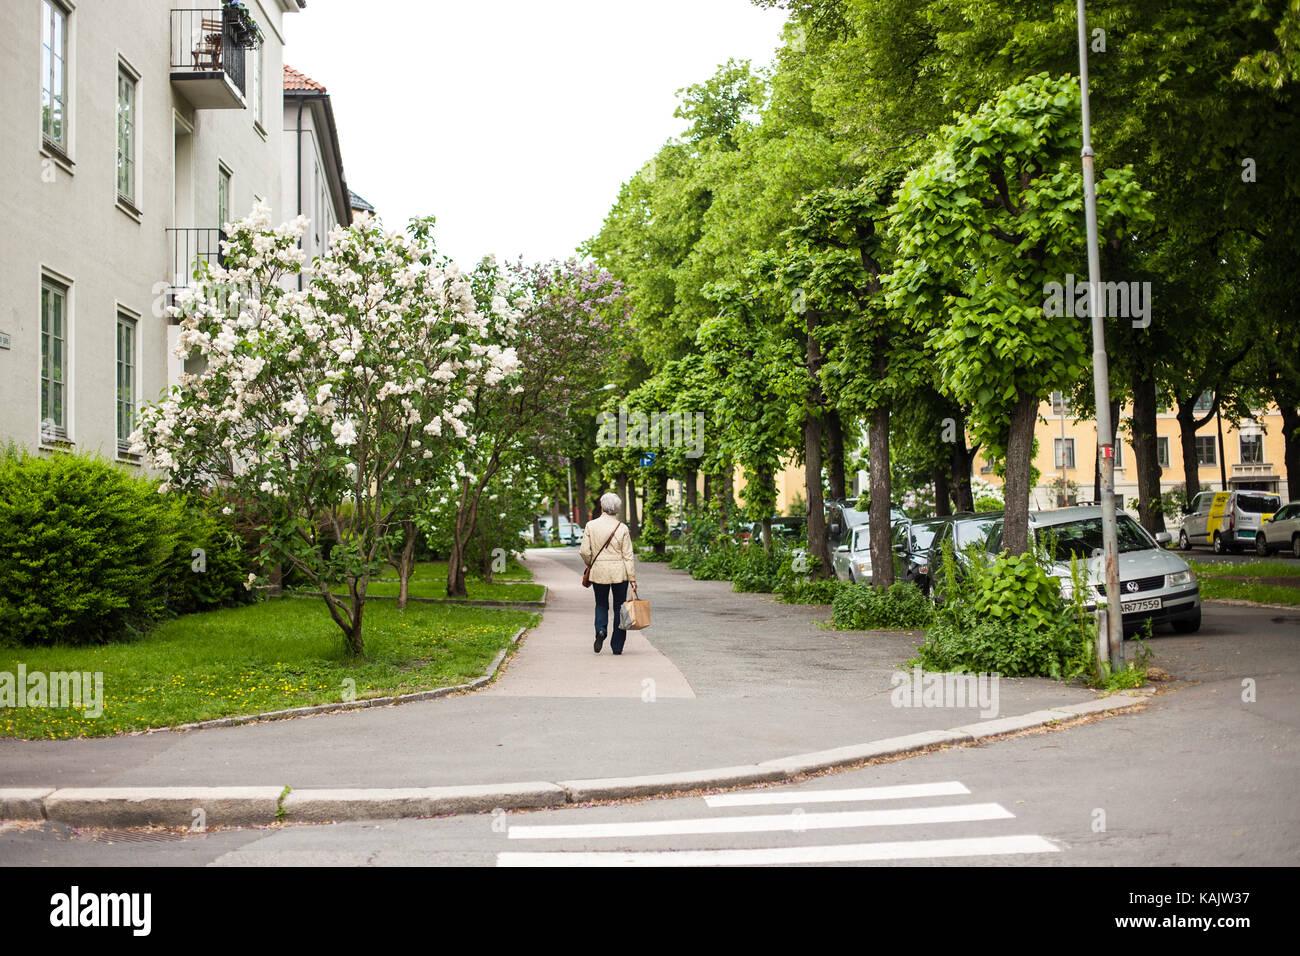 An elderly woman crosses the street in Oslo, Norway - Stock Image